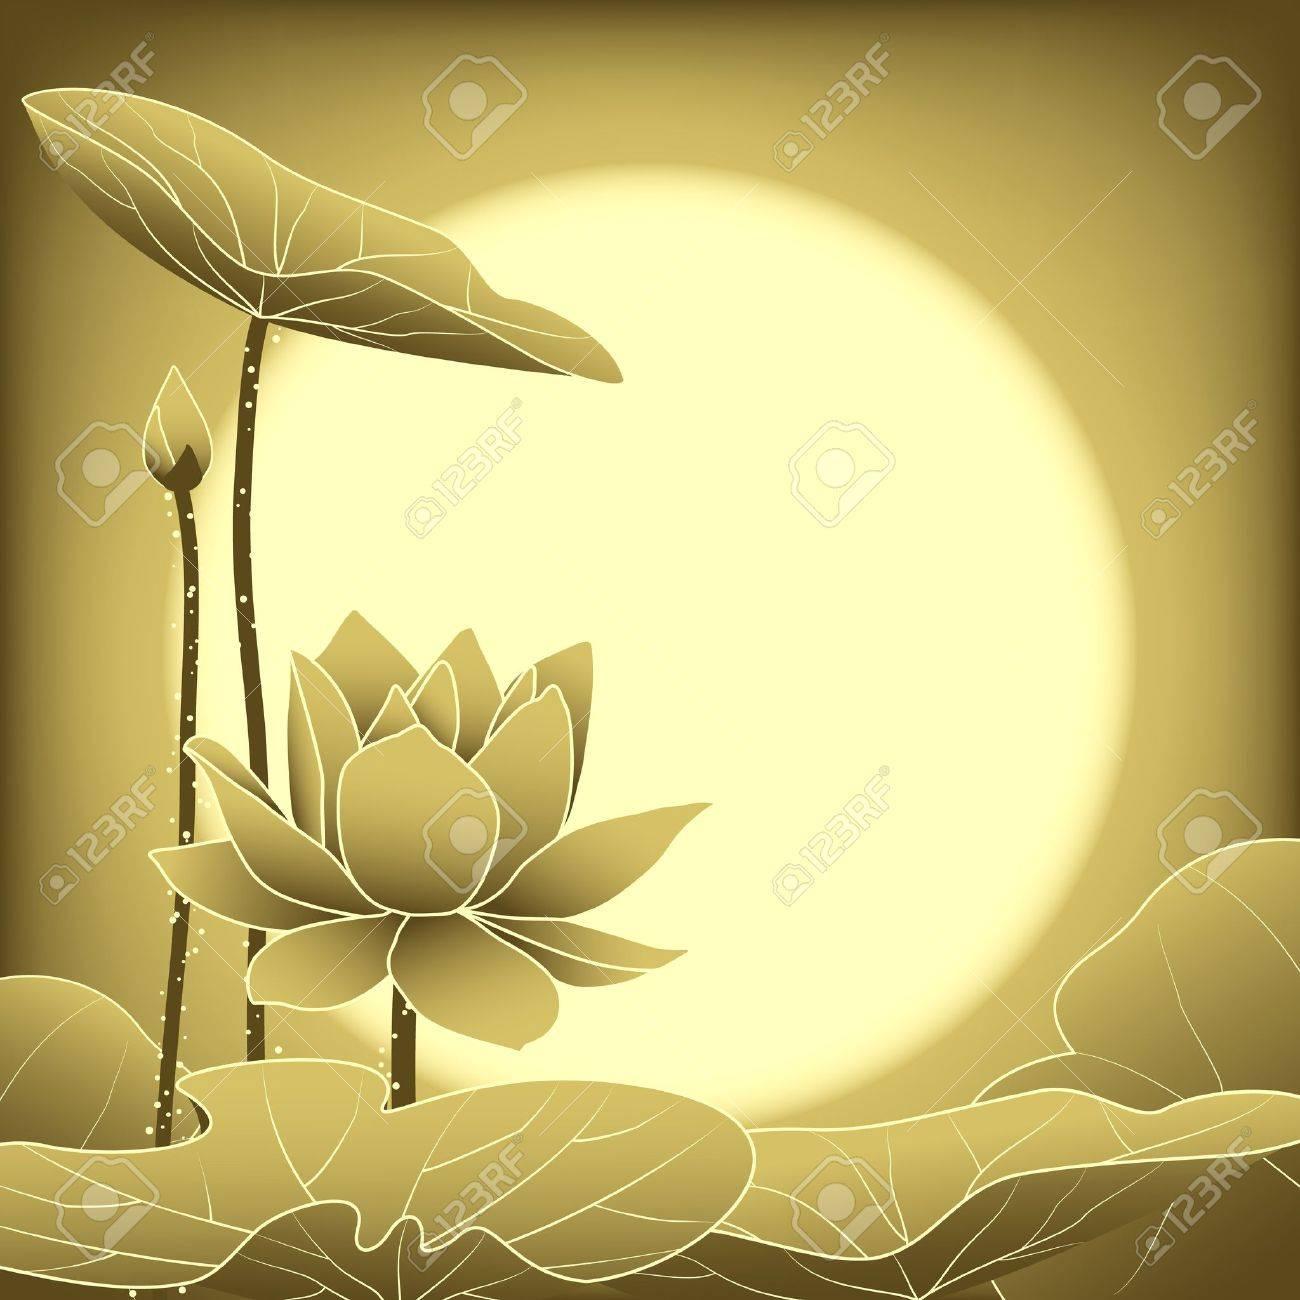 oriental mid autumn festival lotus flower wallpaper royalty free